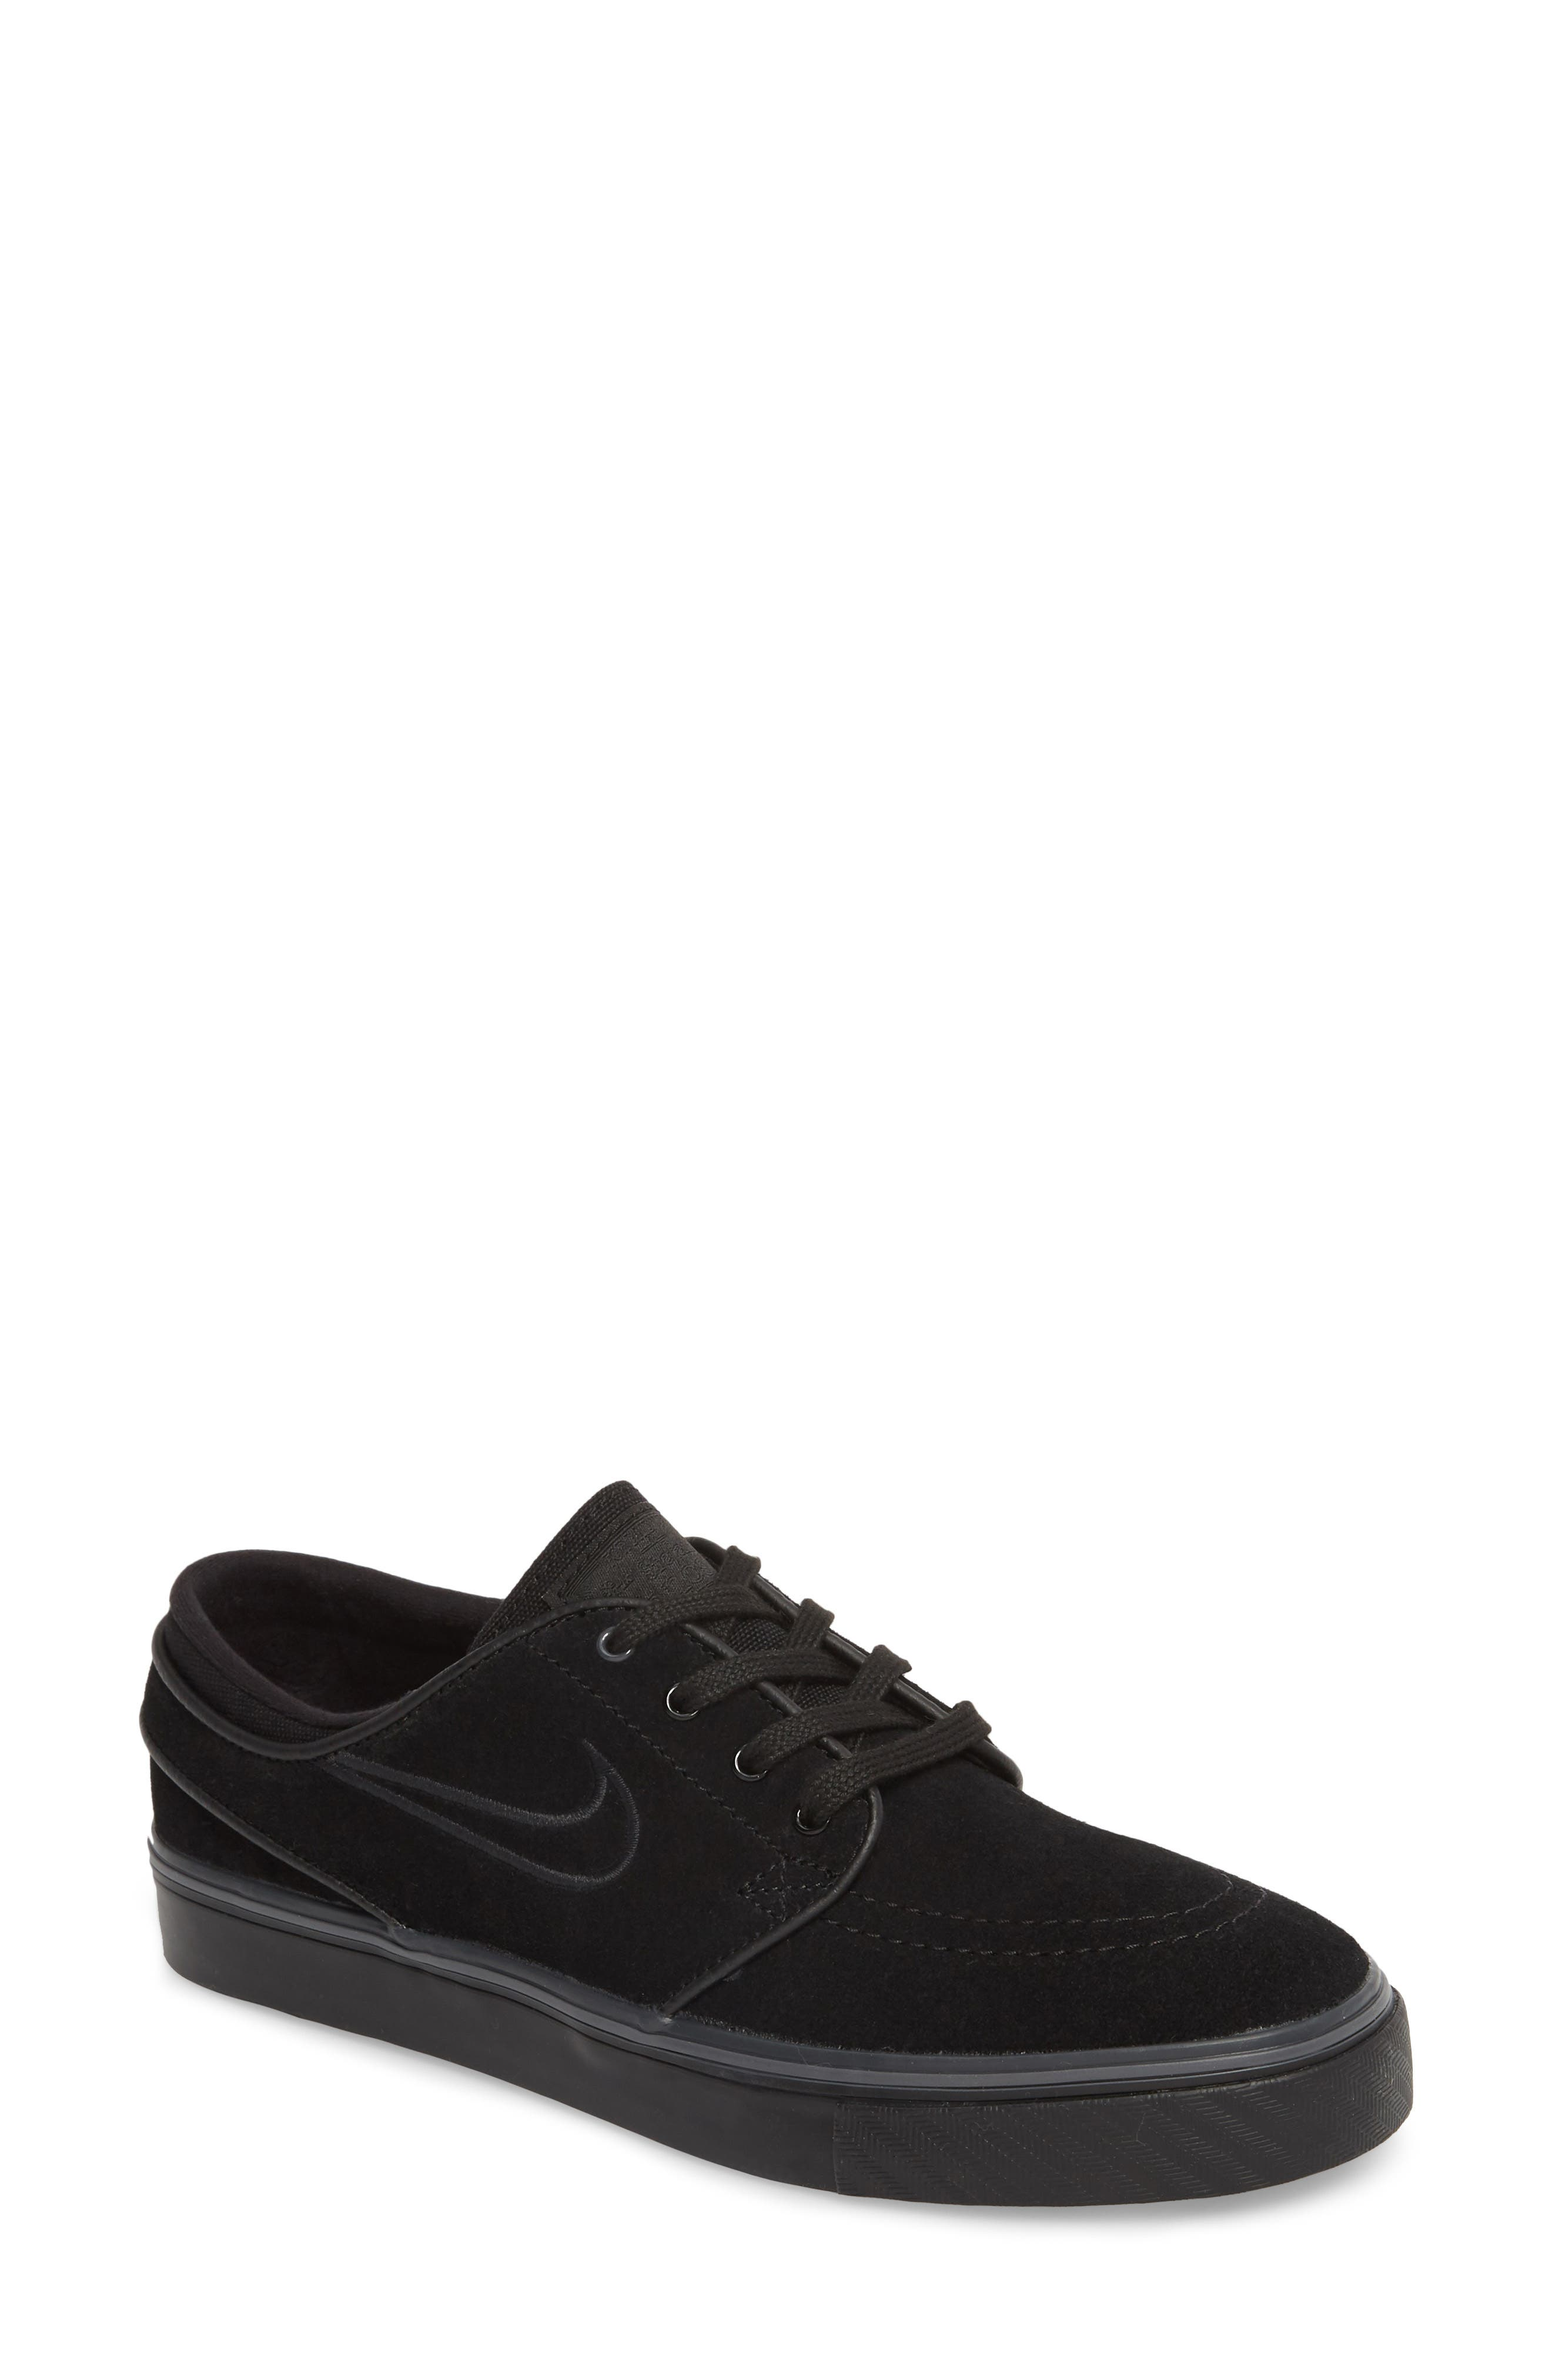 SB Air Zoom Stefan Janoski Skate Sneaker,                             Main thumbnail 1, color,                             BLACK/ BLACK/ BLACK